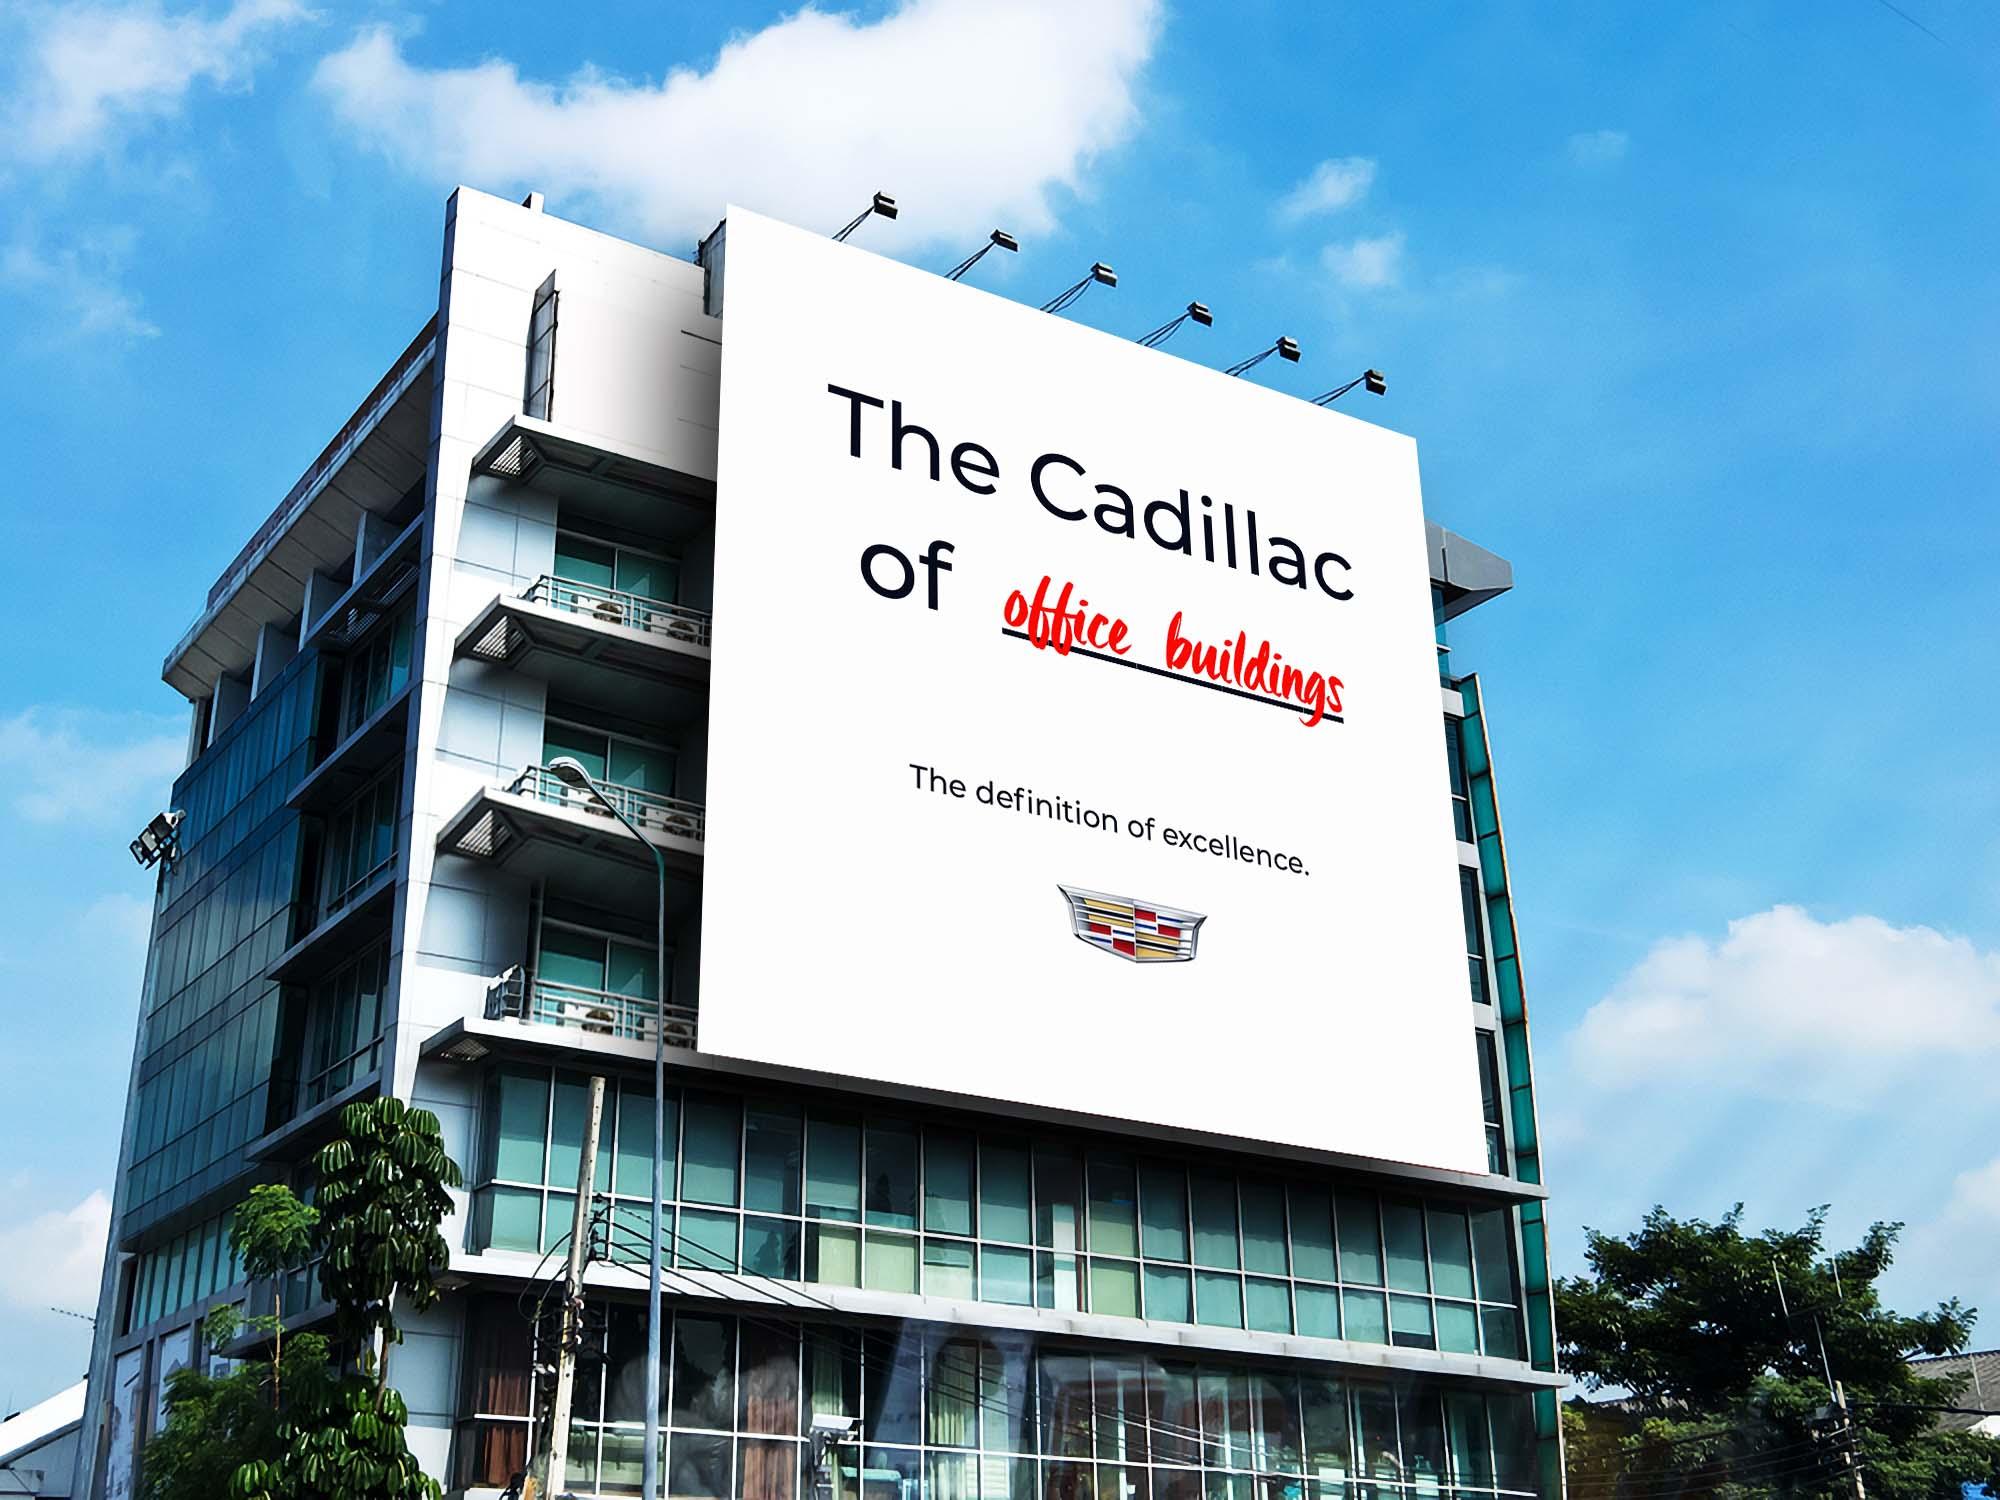 Cadillac Outdoor Ad Edit.jpg